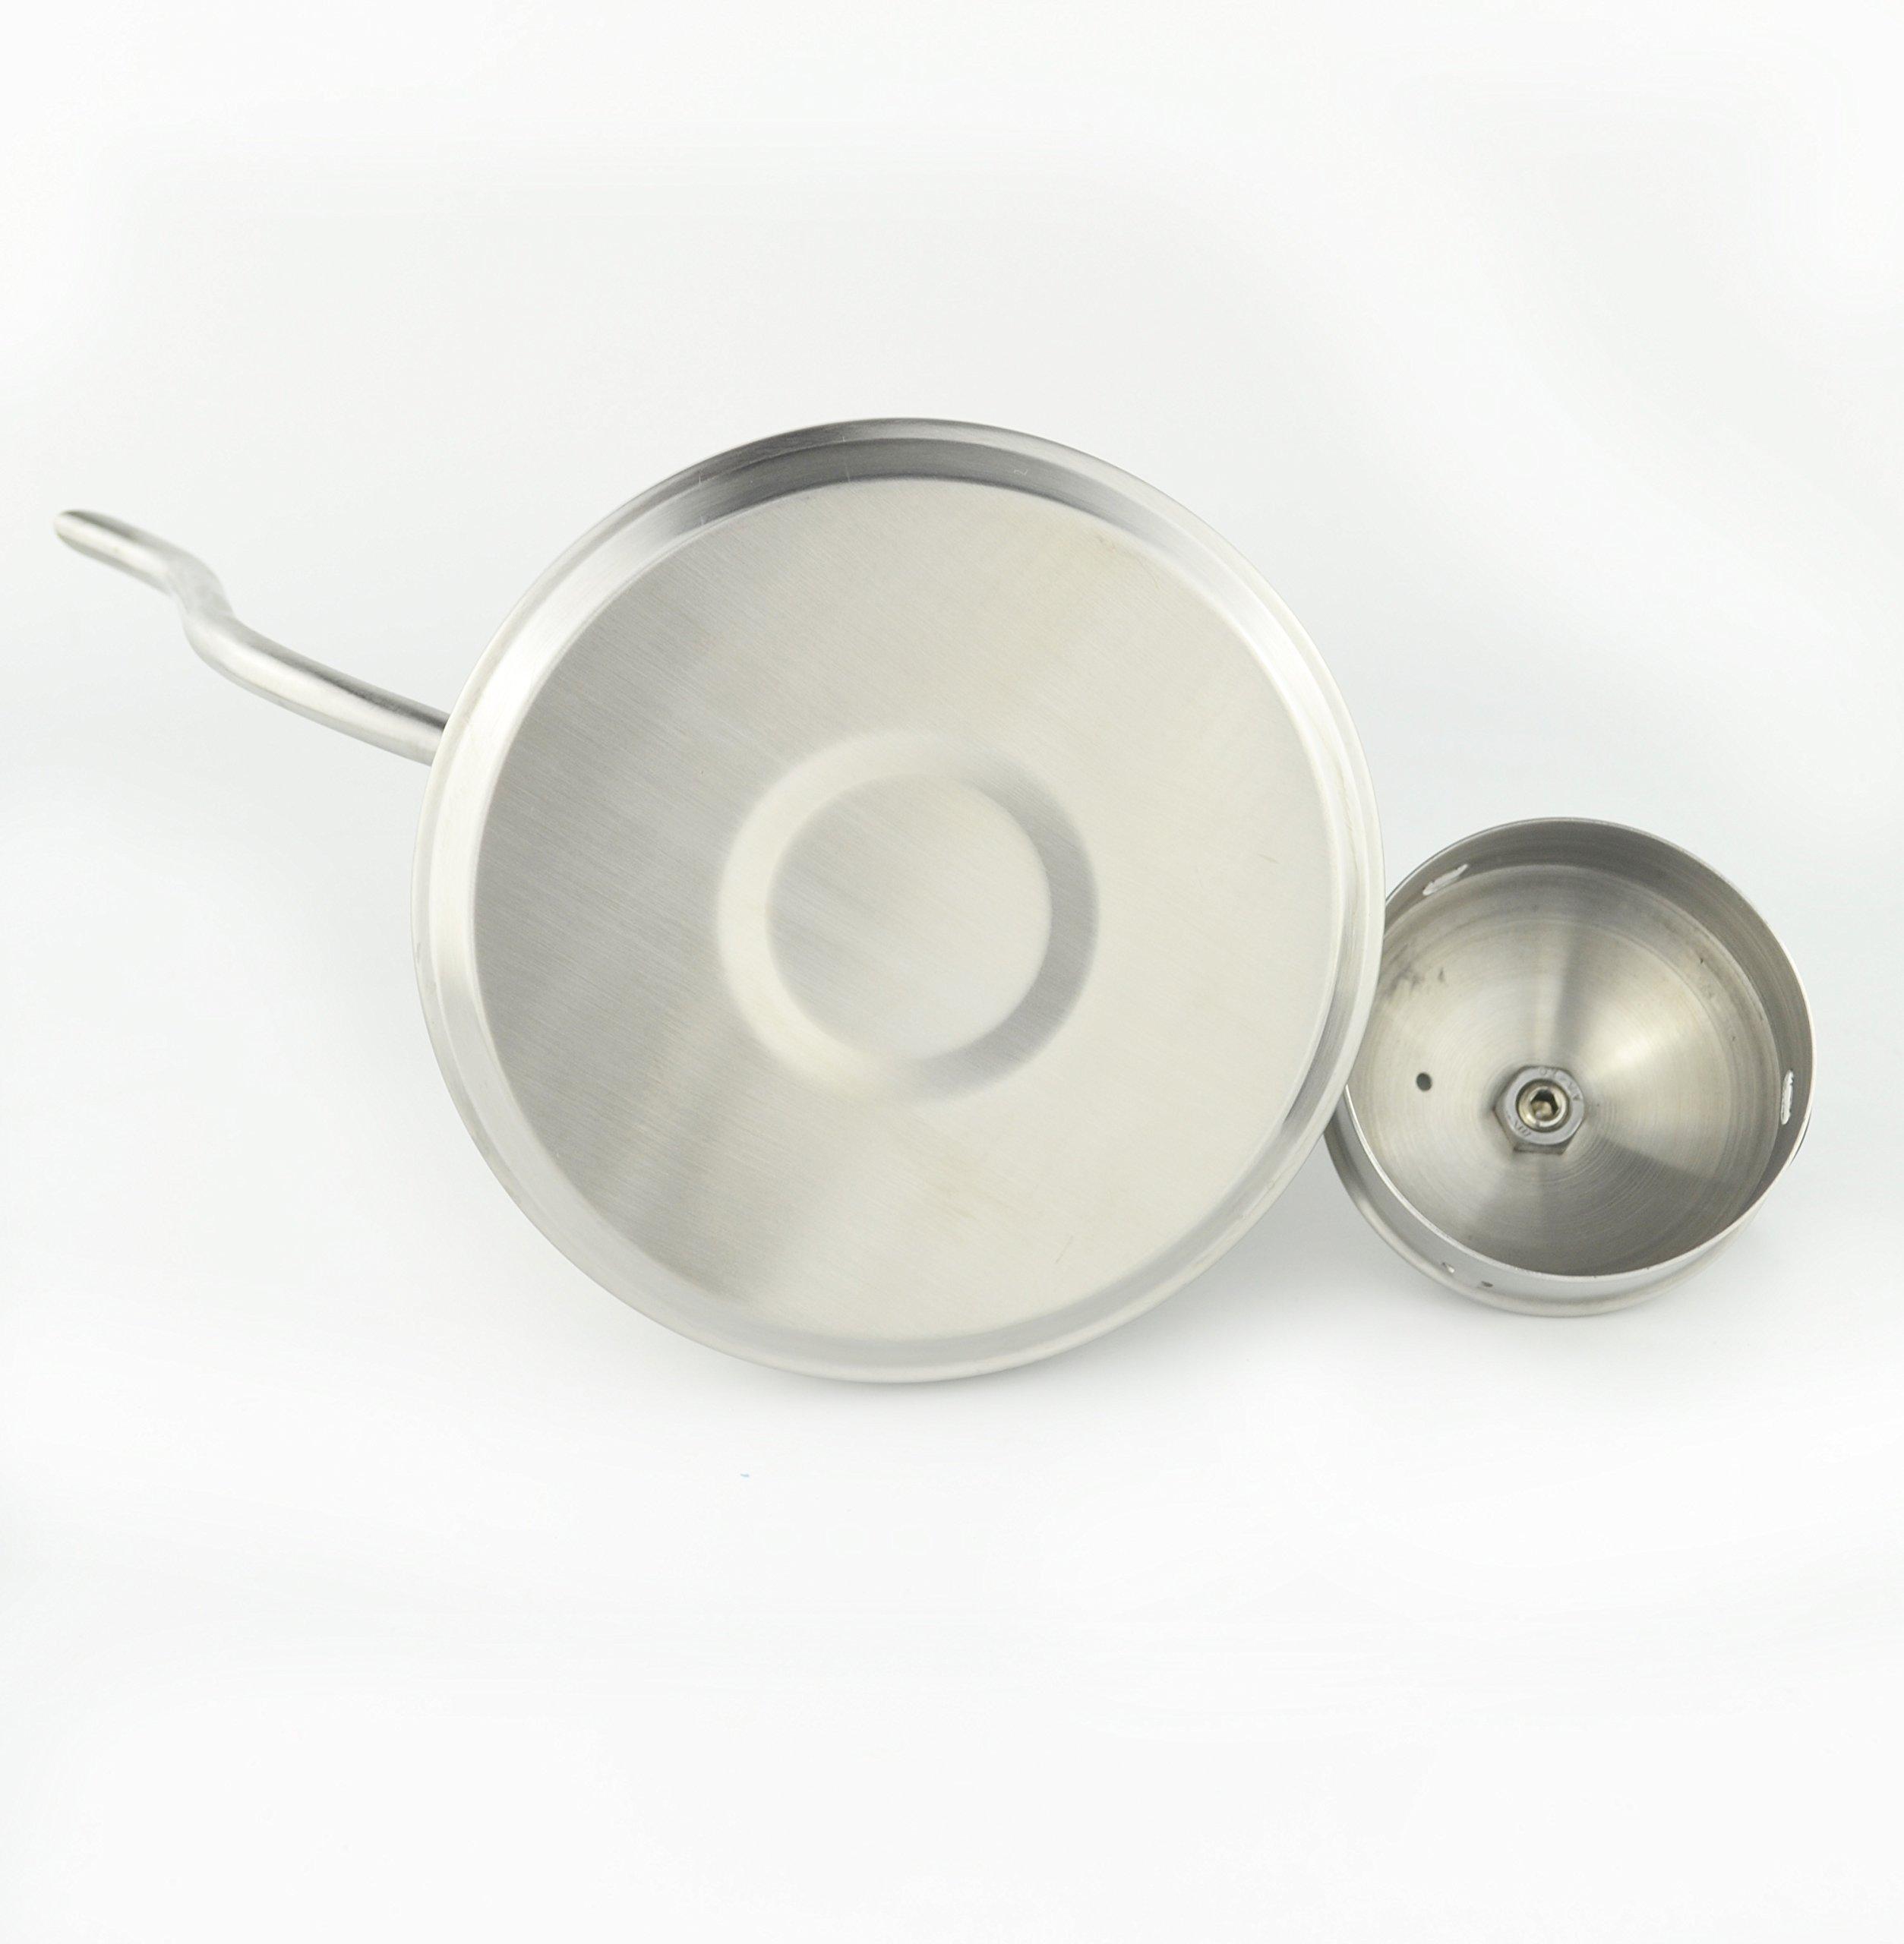 SAMYO Coffee & Tea Drip Kettle - Stainless Steel Precision Gooseneck Spout With Ergonomic Handle